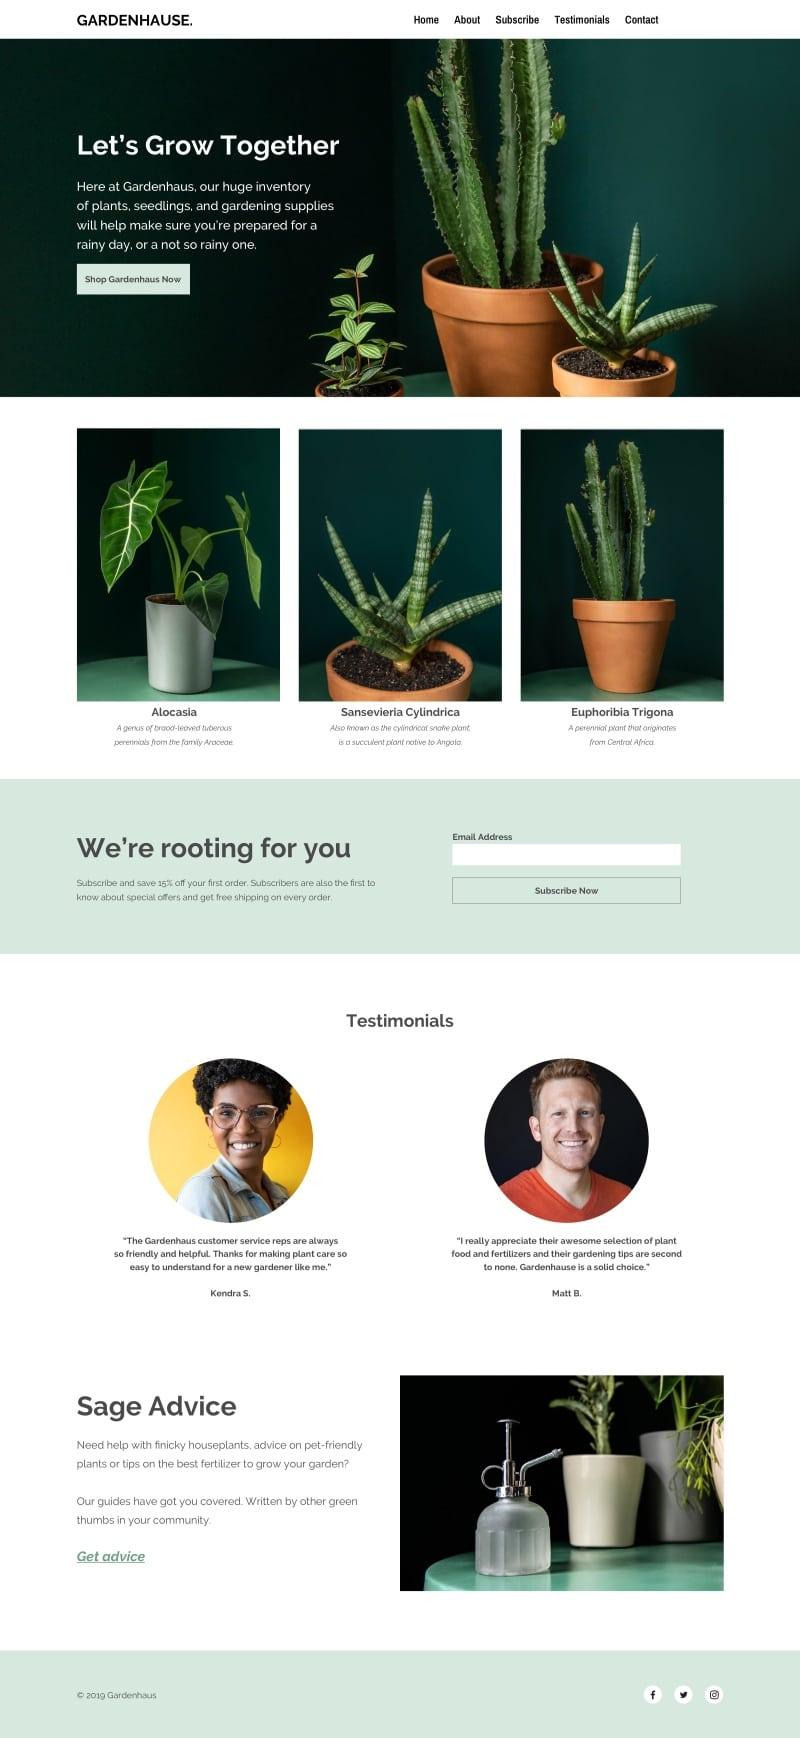 Full-Image_Websites_Gardenhaus